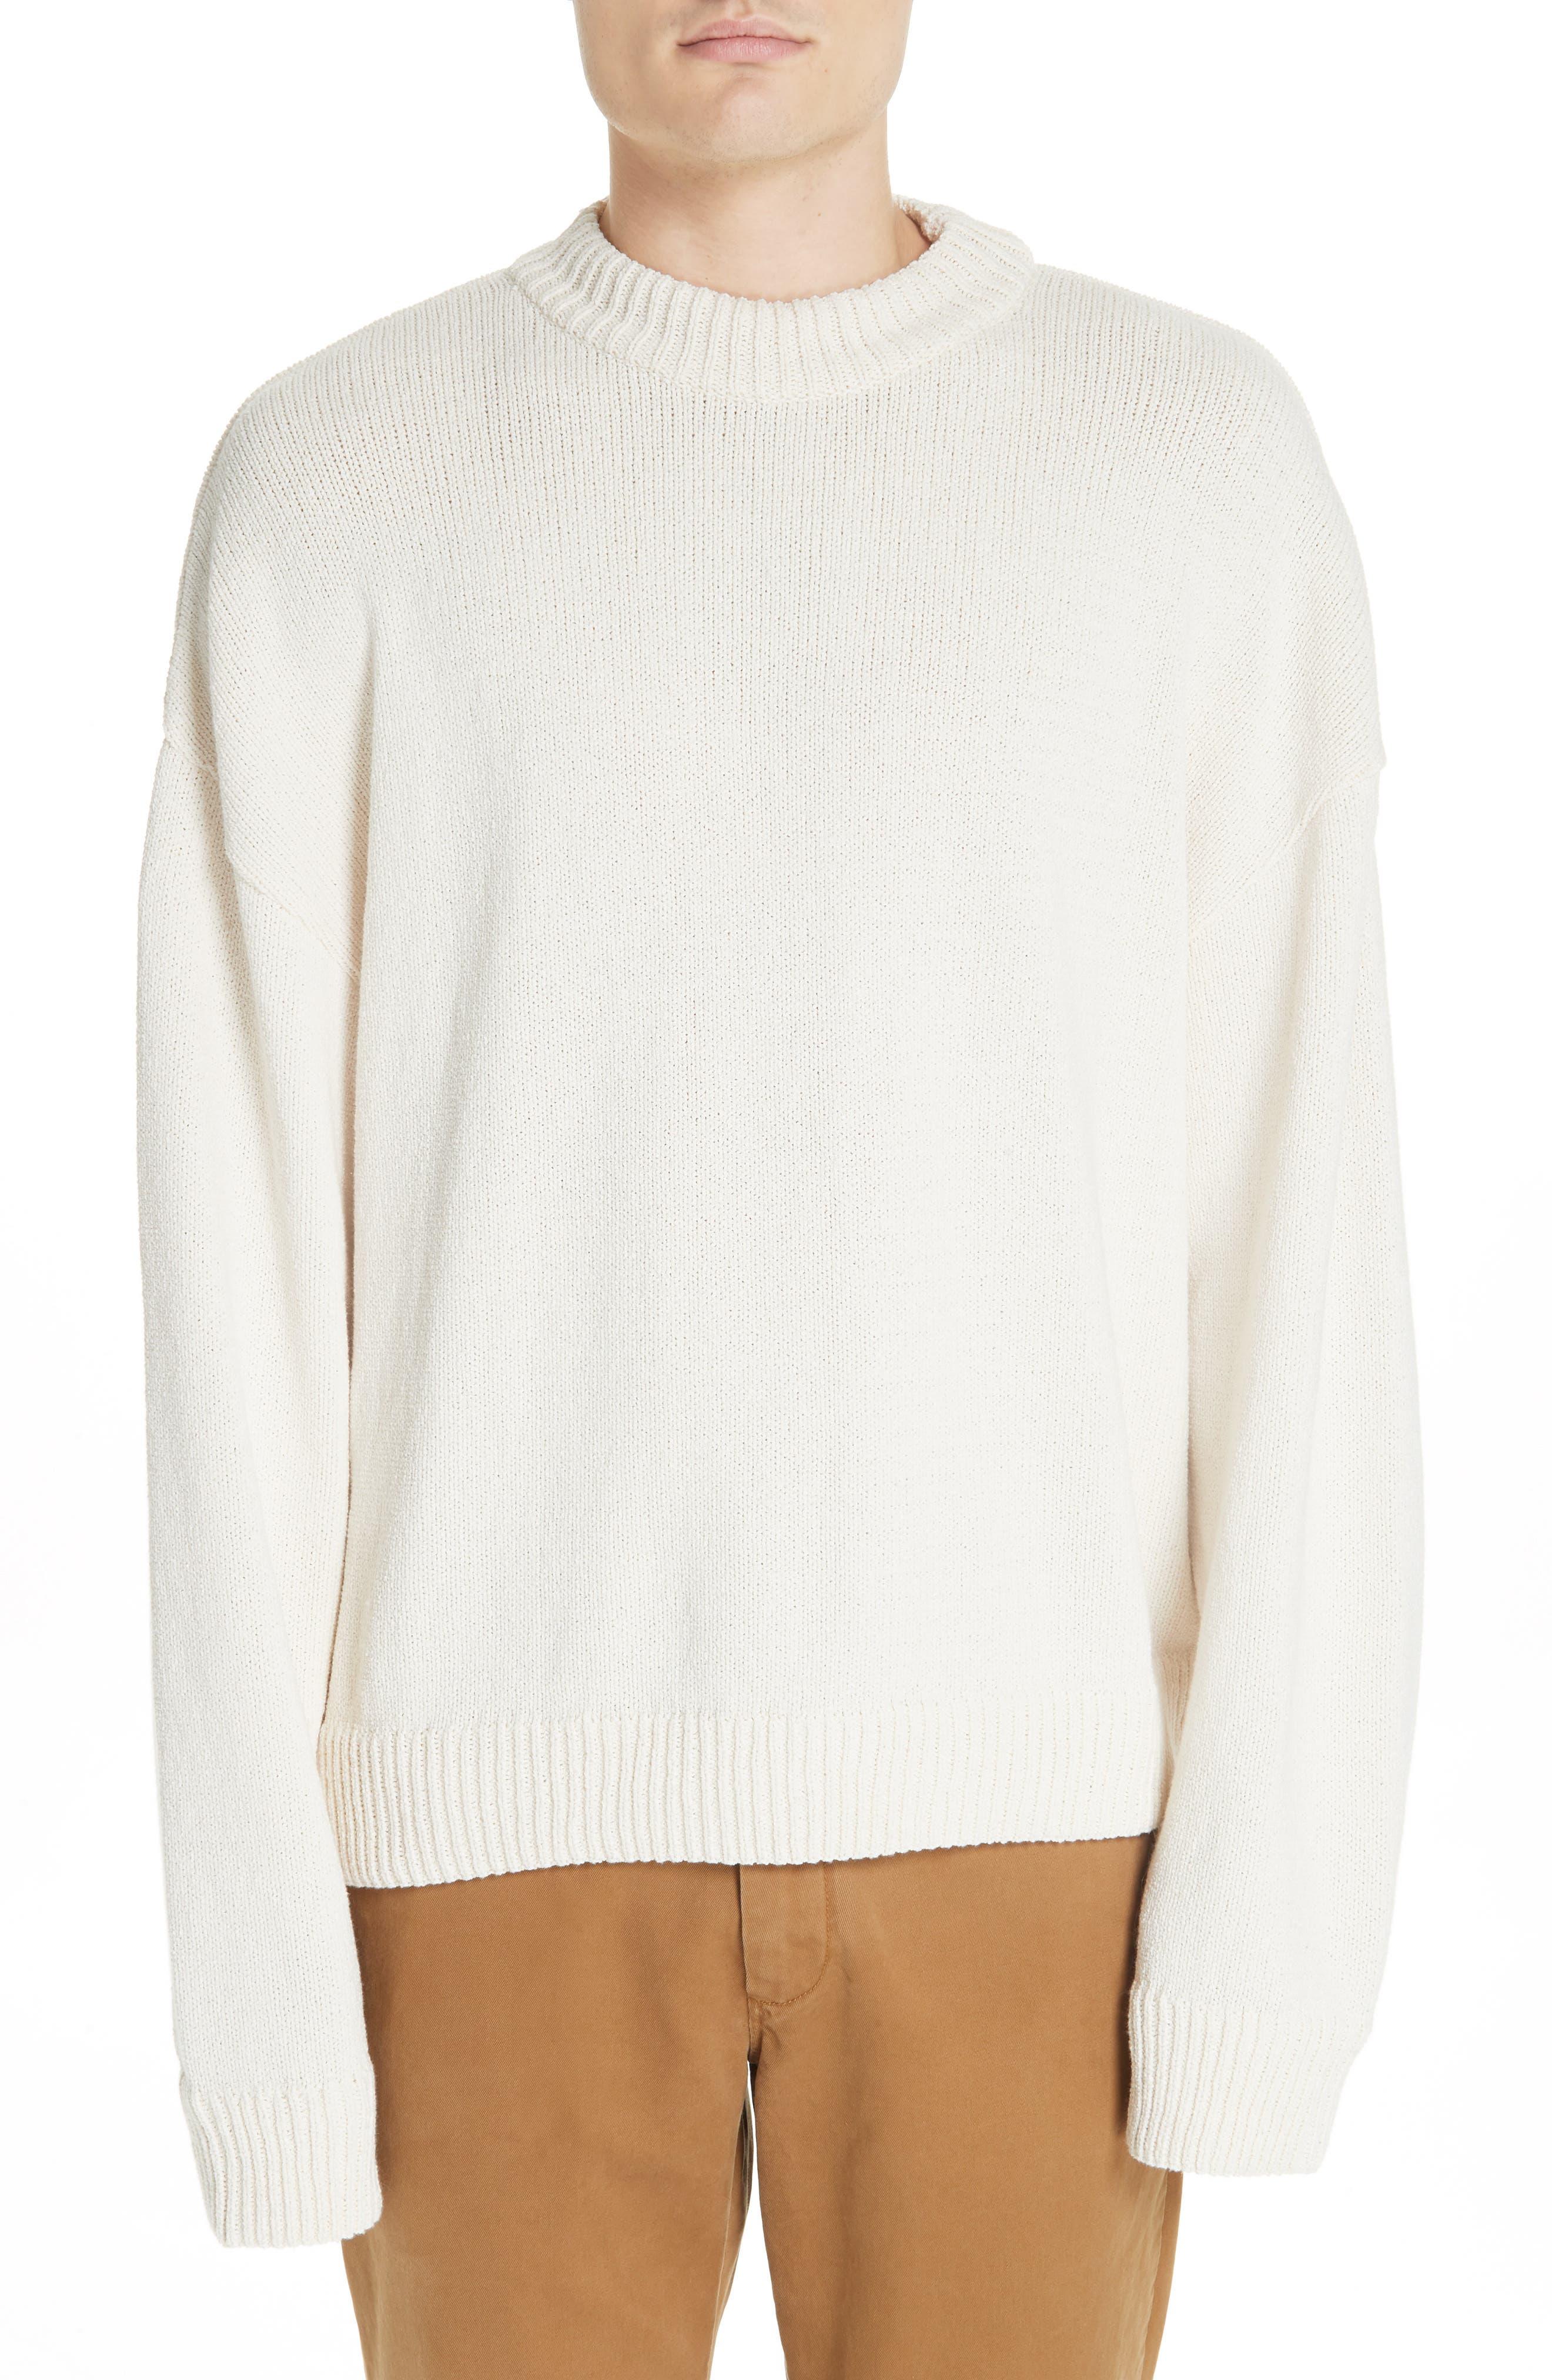 Somar Oversized Crewneck Sweater,                             Main thumbnail 1, color,                             100